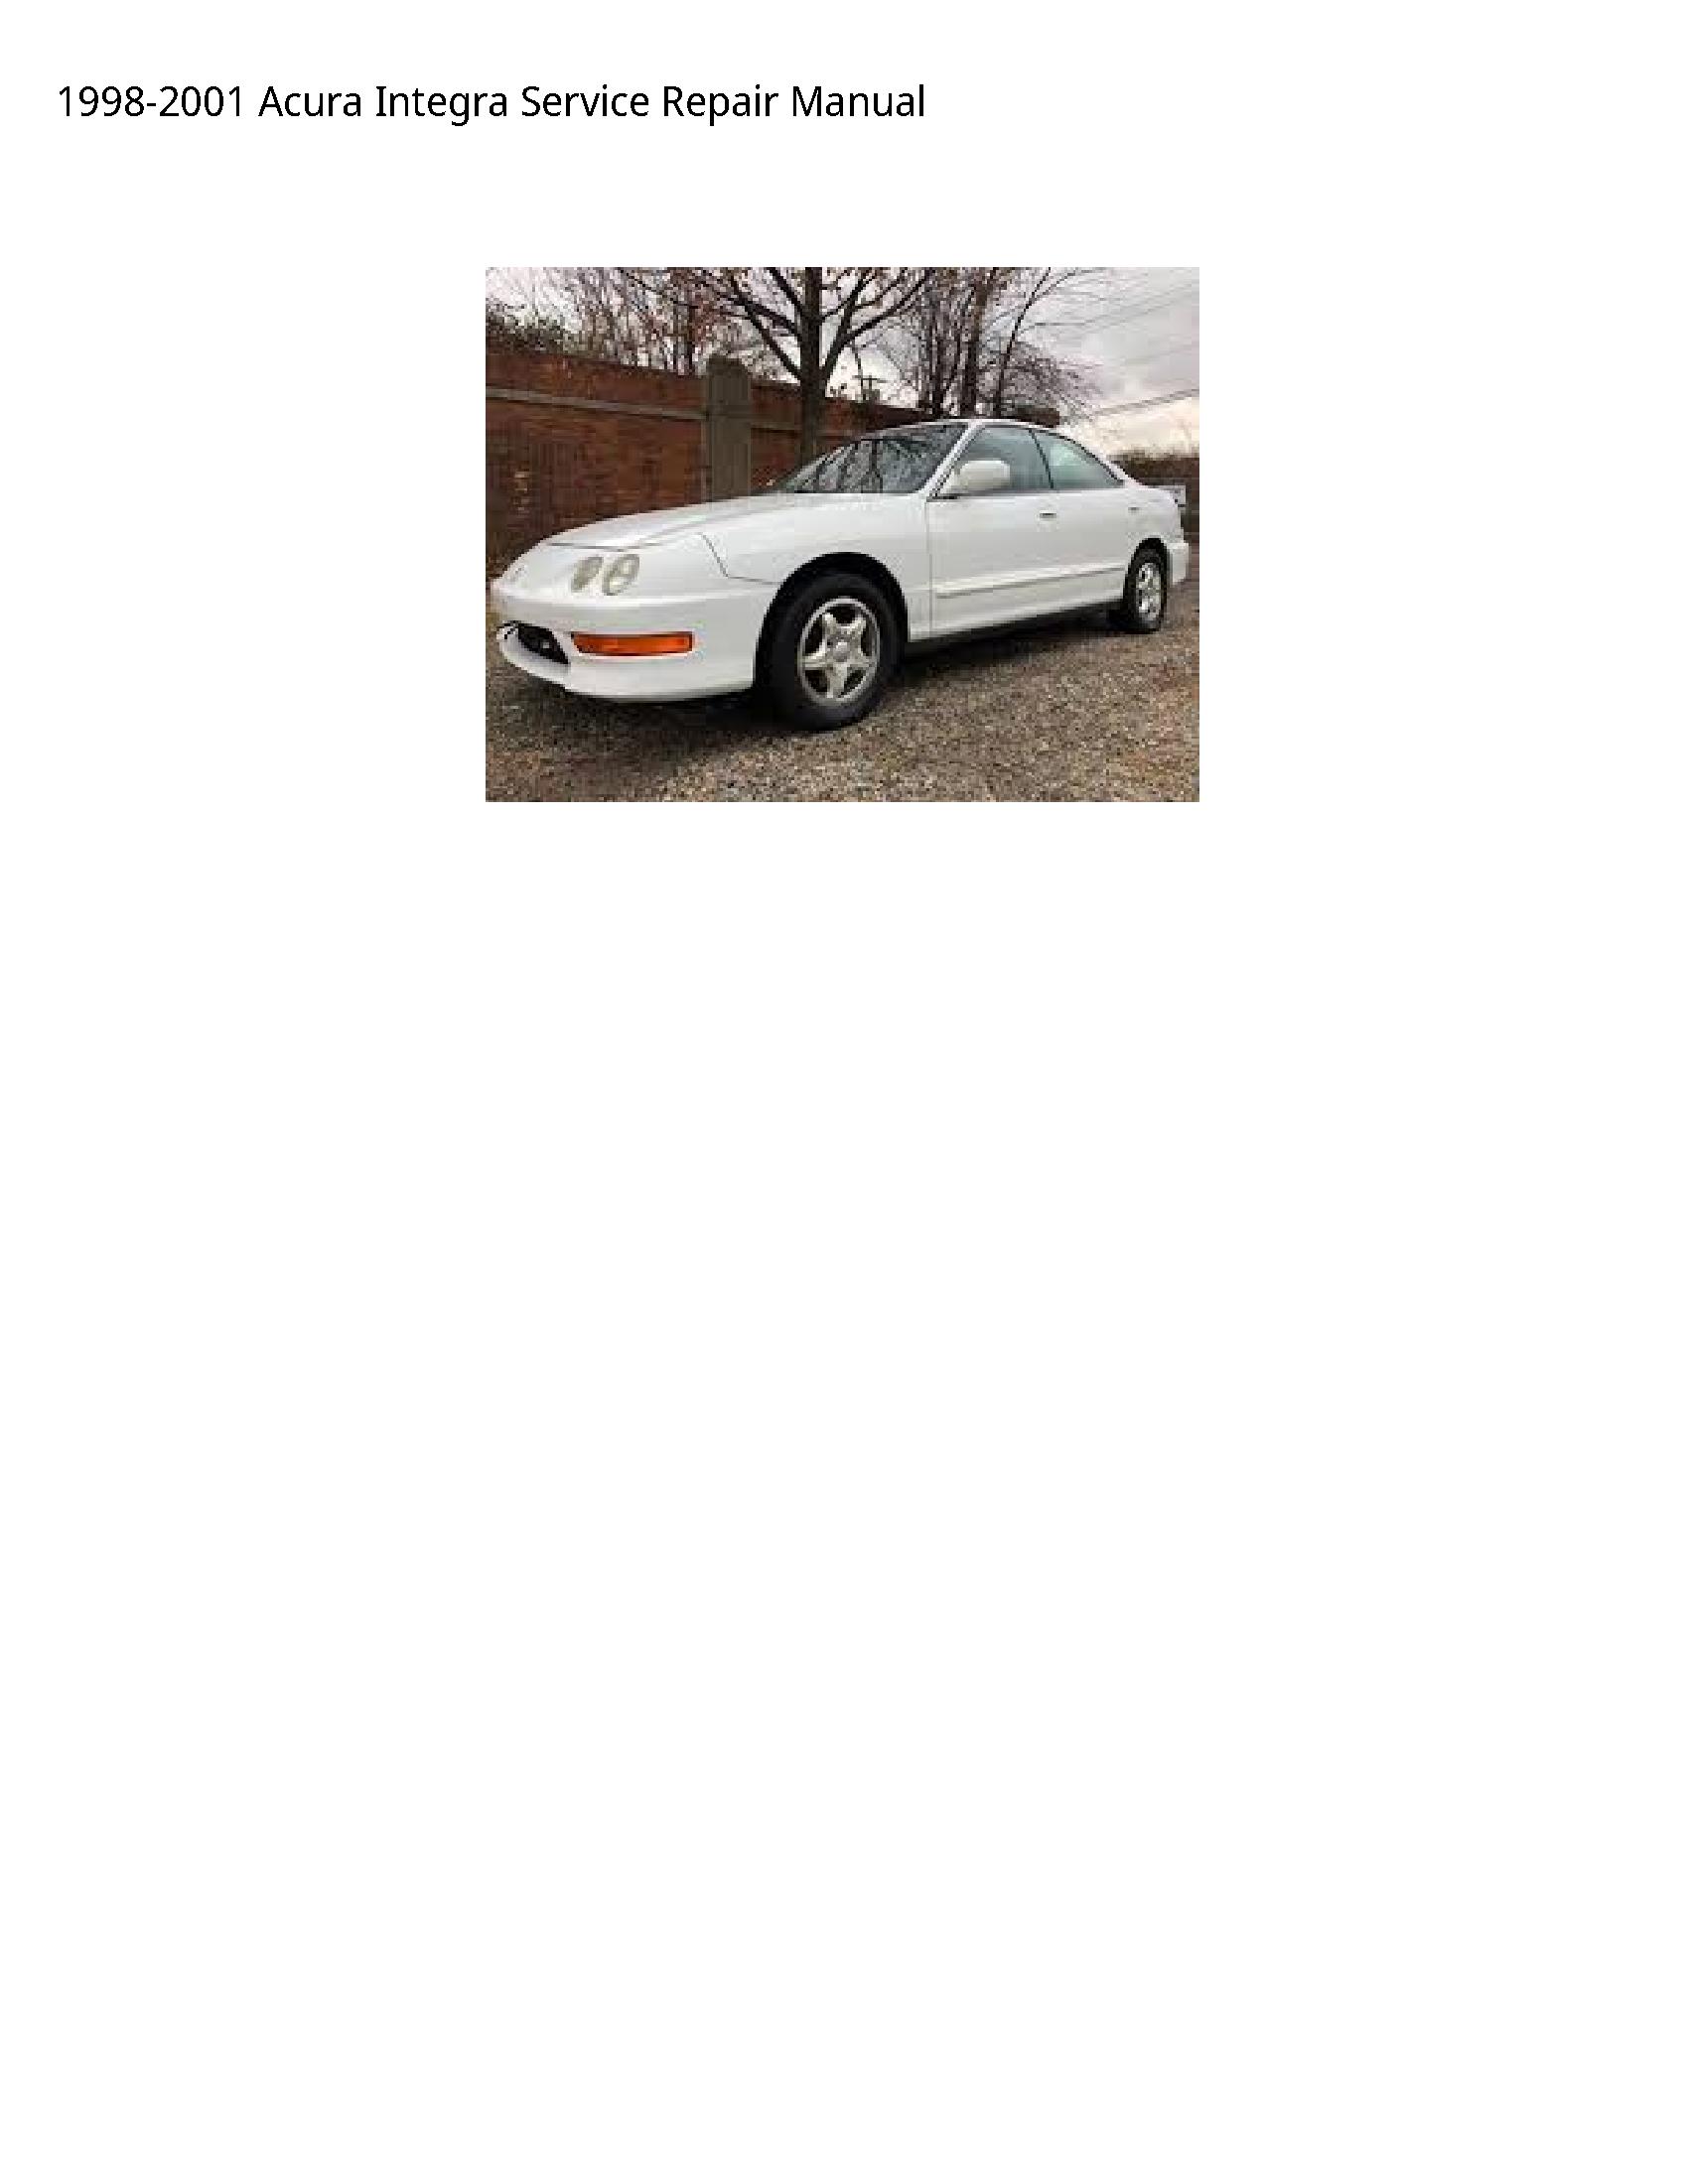 Acura Integra manual